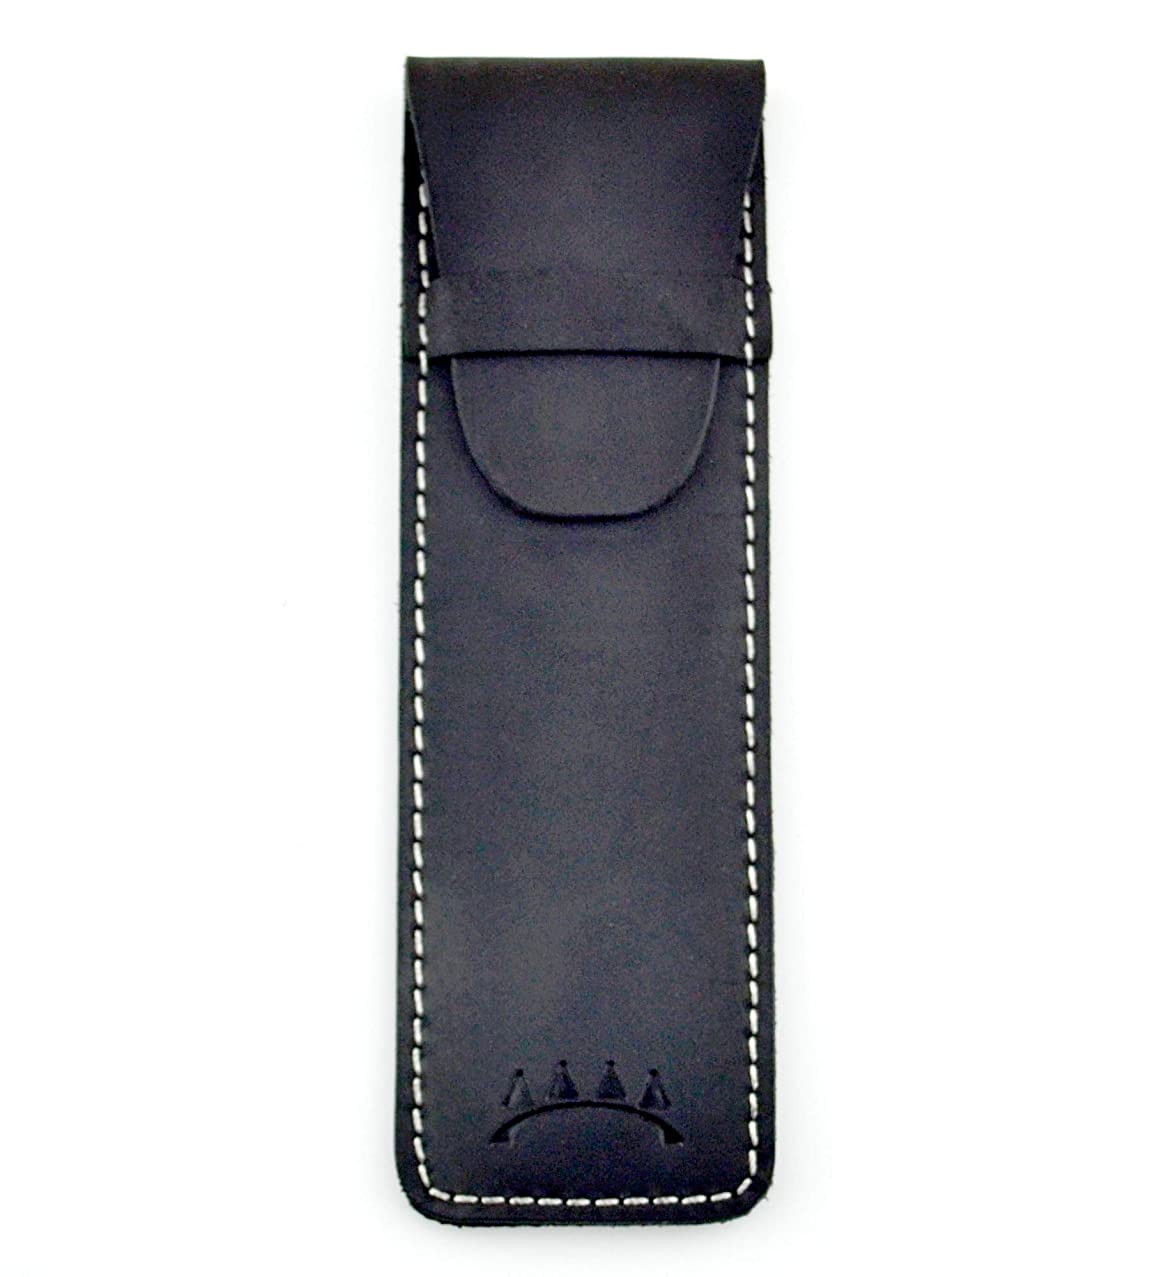 Genuine Leather Single Pen Case with Flap Close, Top Grain Leather (Black)